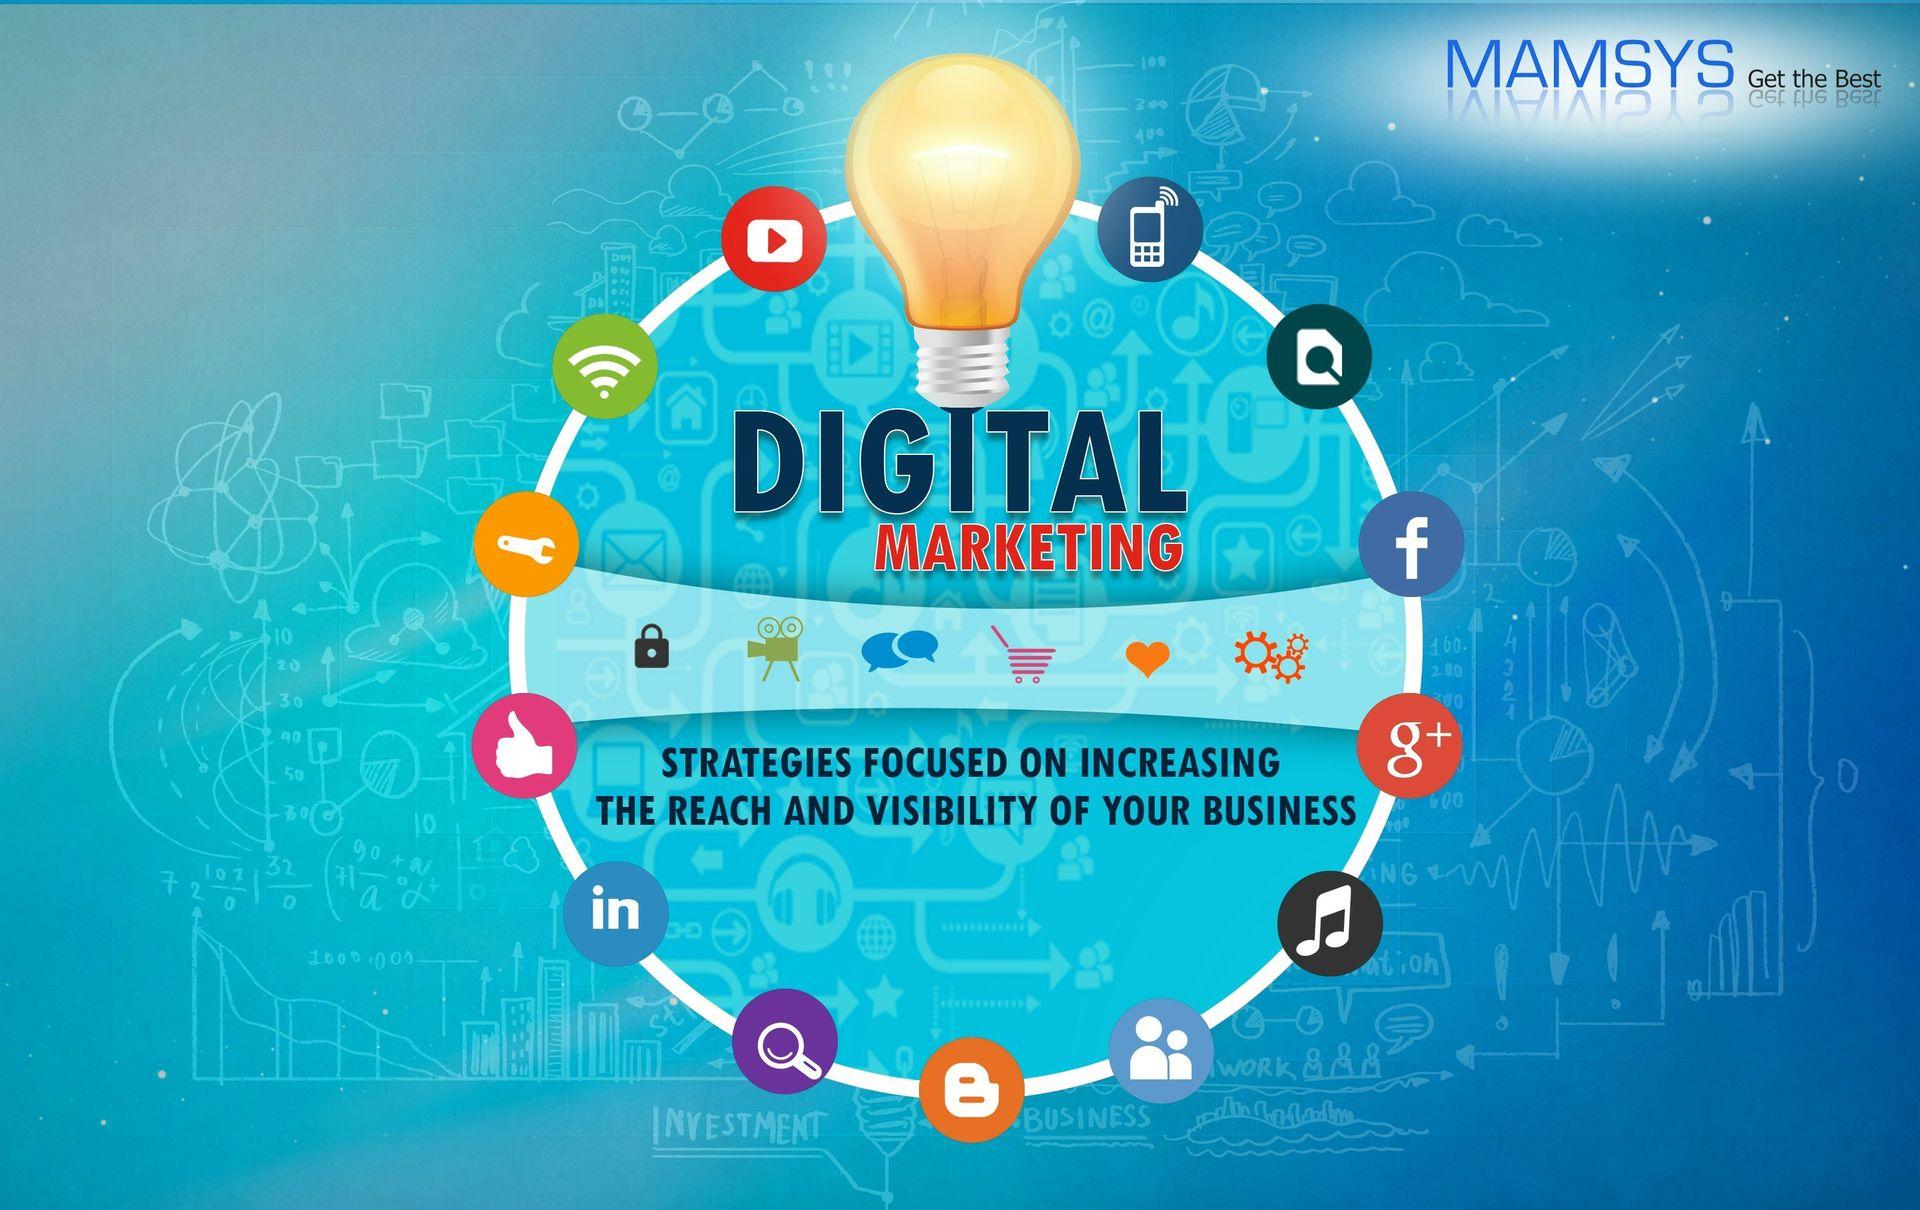 digital-marketing-creative-08-01-2015-digital-marketing